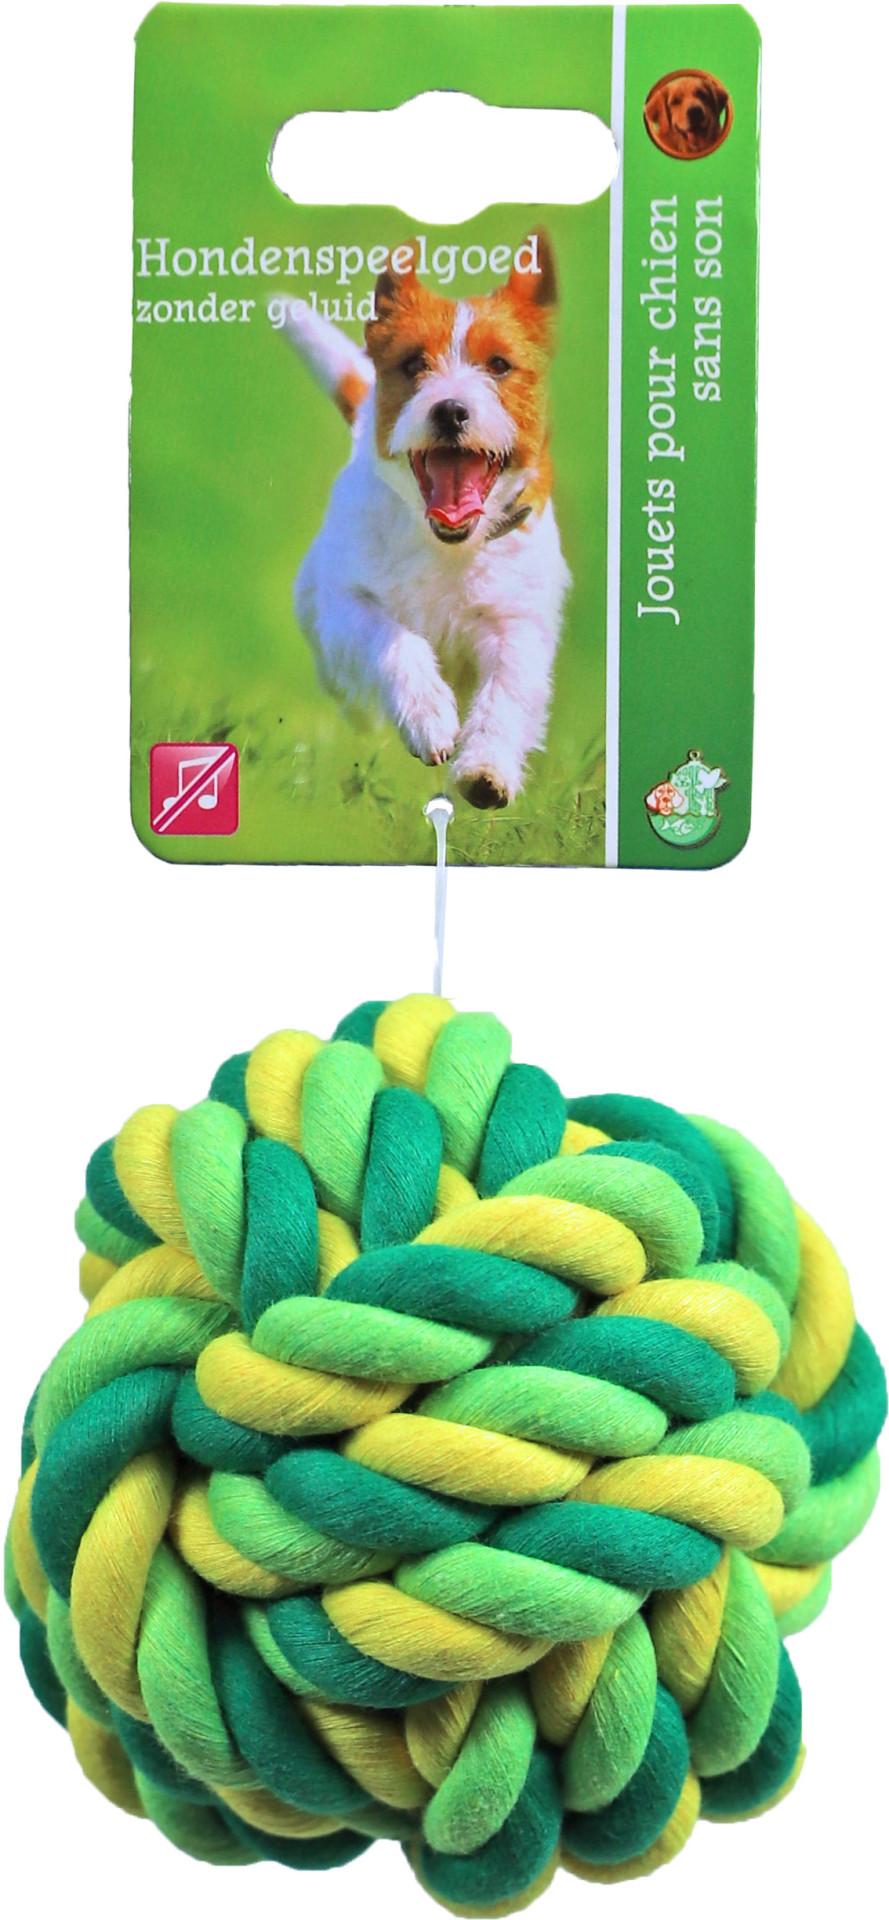 Touwbal Groen/geel